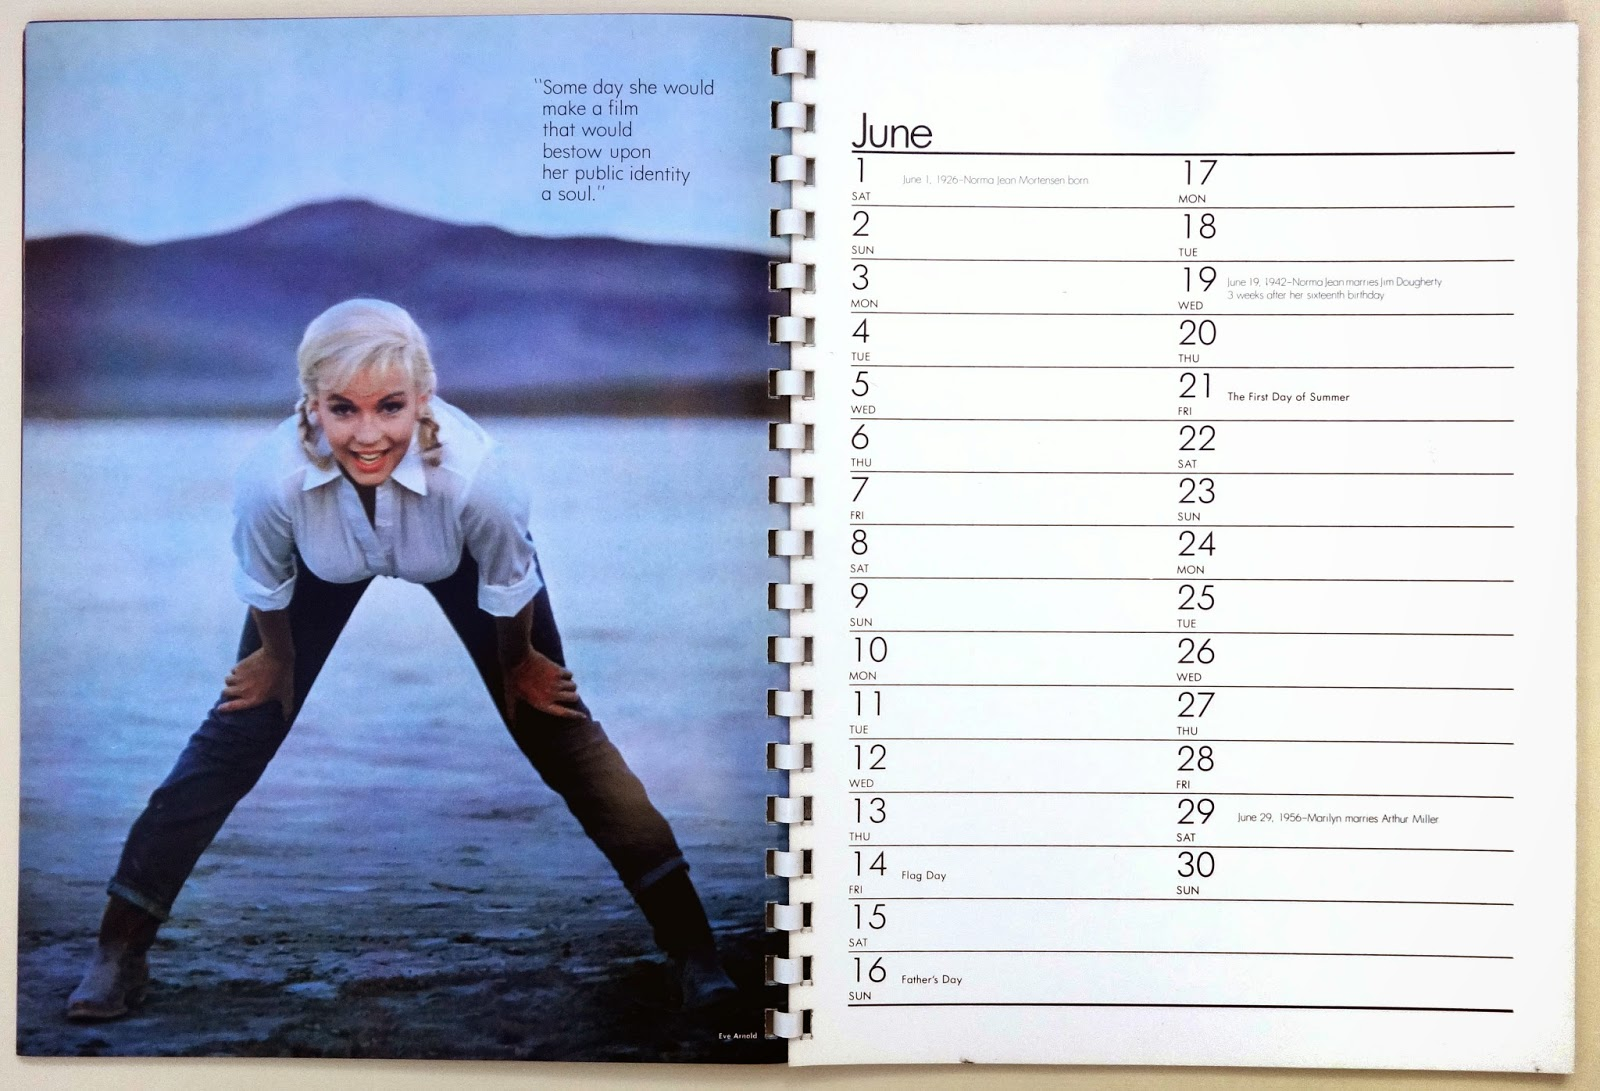 1974 marilyn monroe datebook dating 3